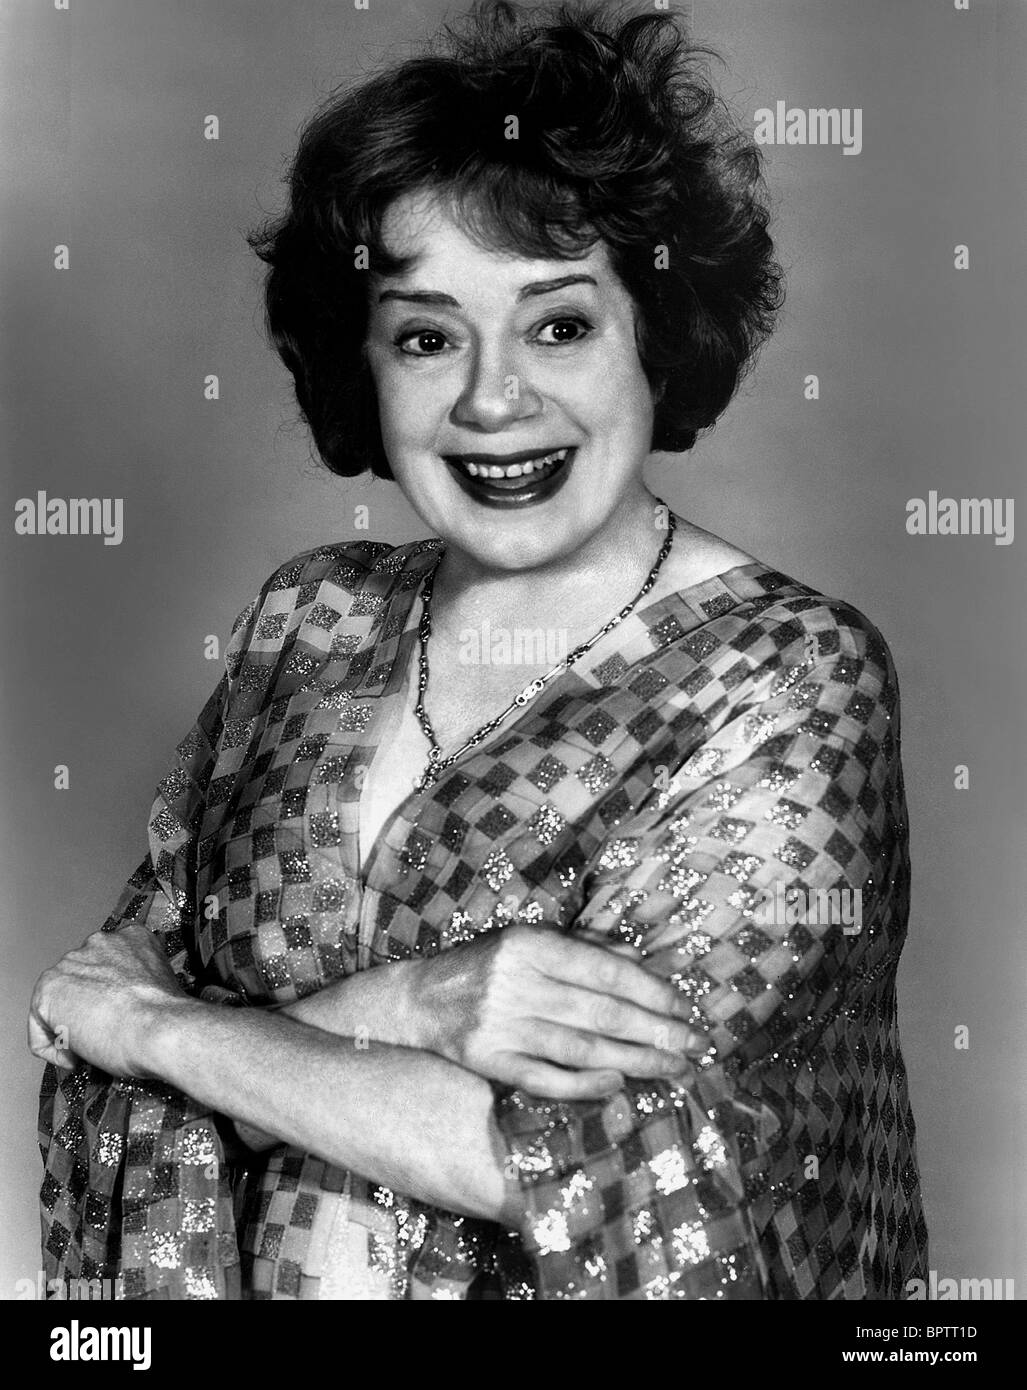 ELSA LANCHESTER ACTRESS (1979) - Stock Image